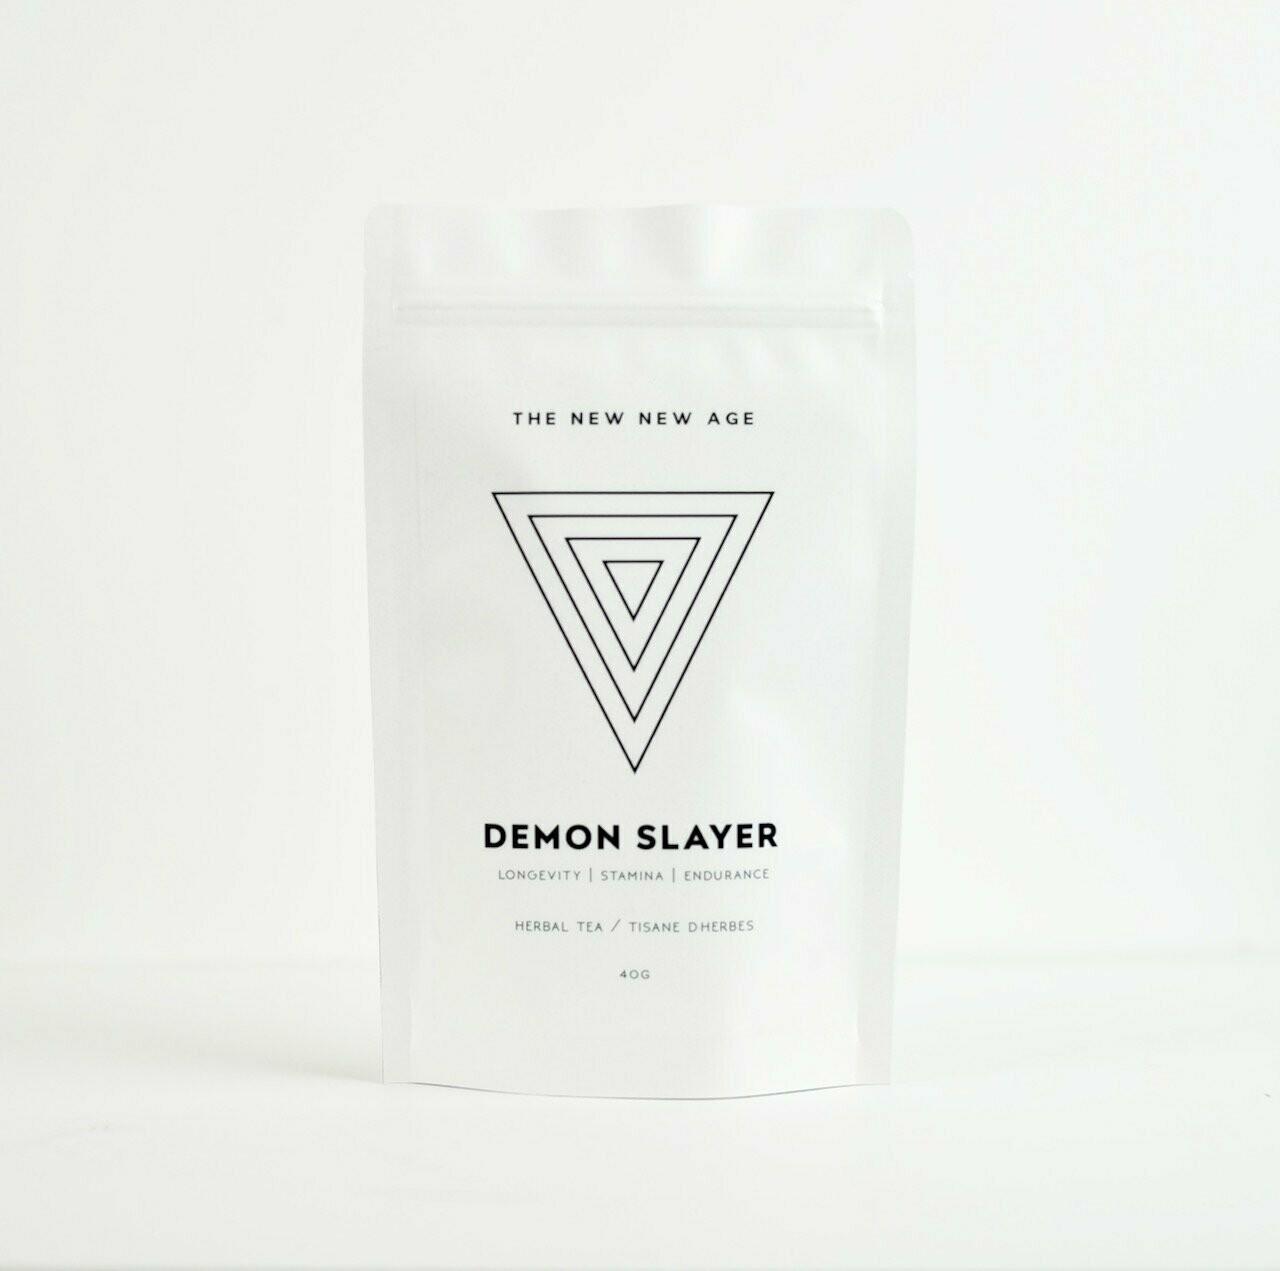 The New New Age Demon Slayer // Rhodiola Root Tonic Tea